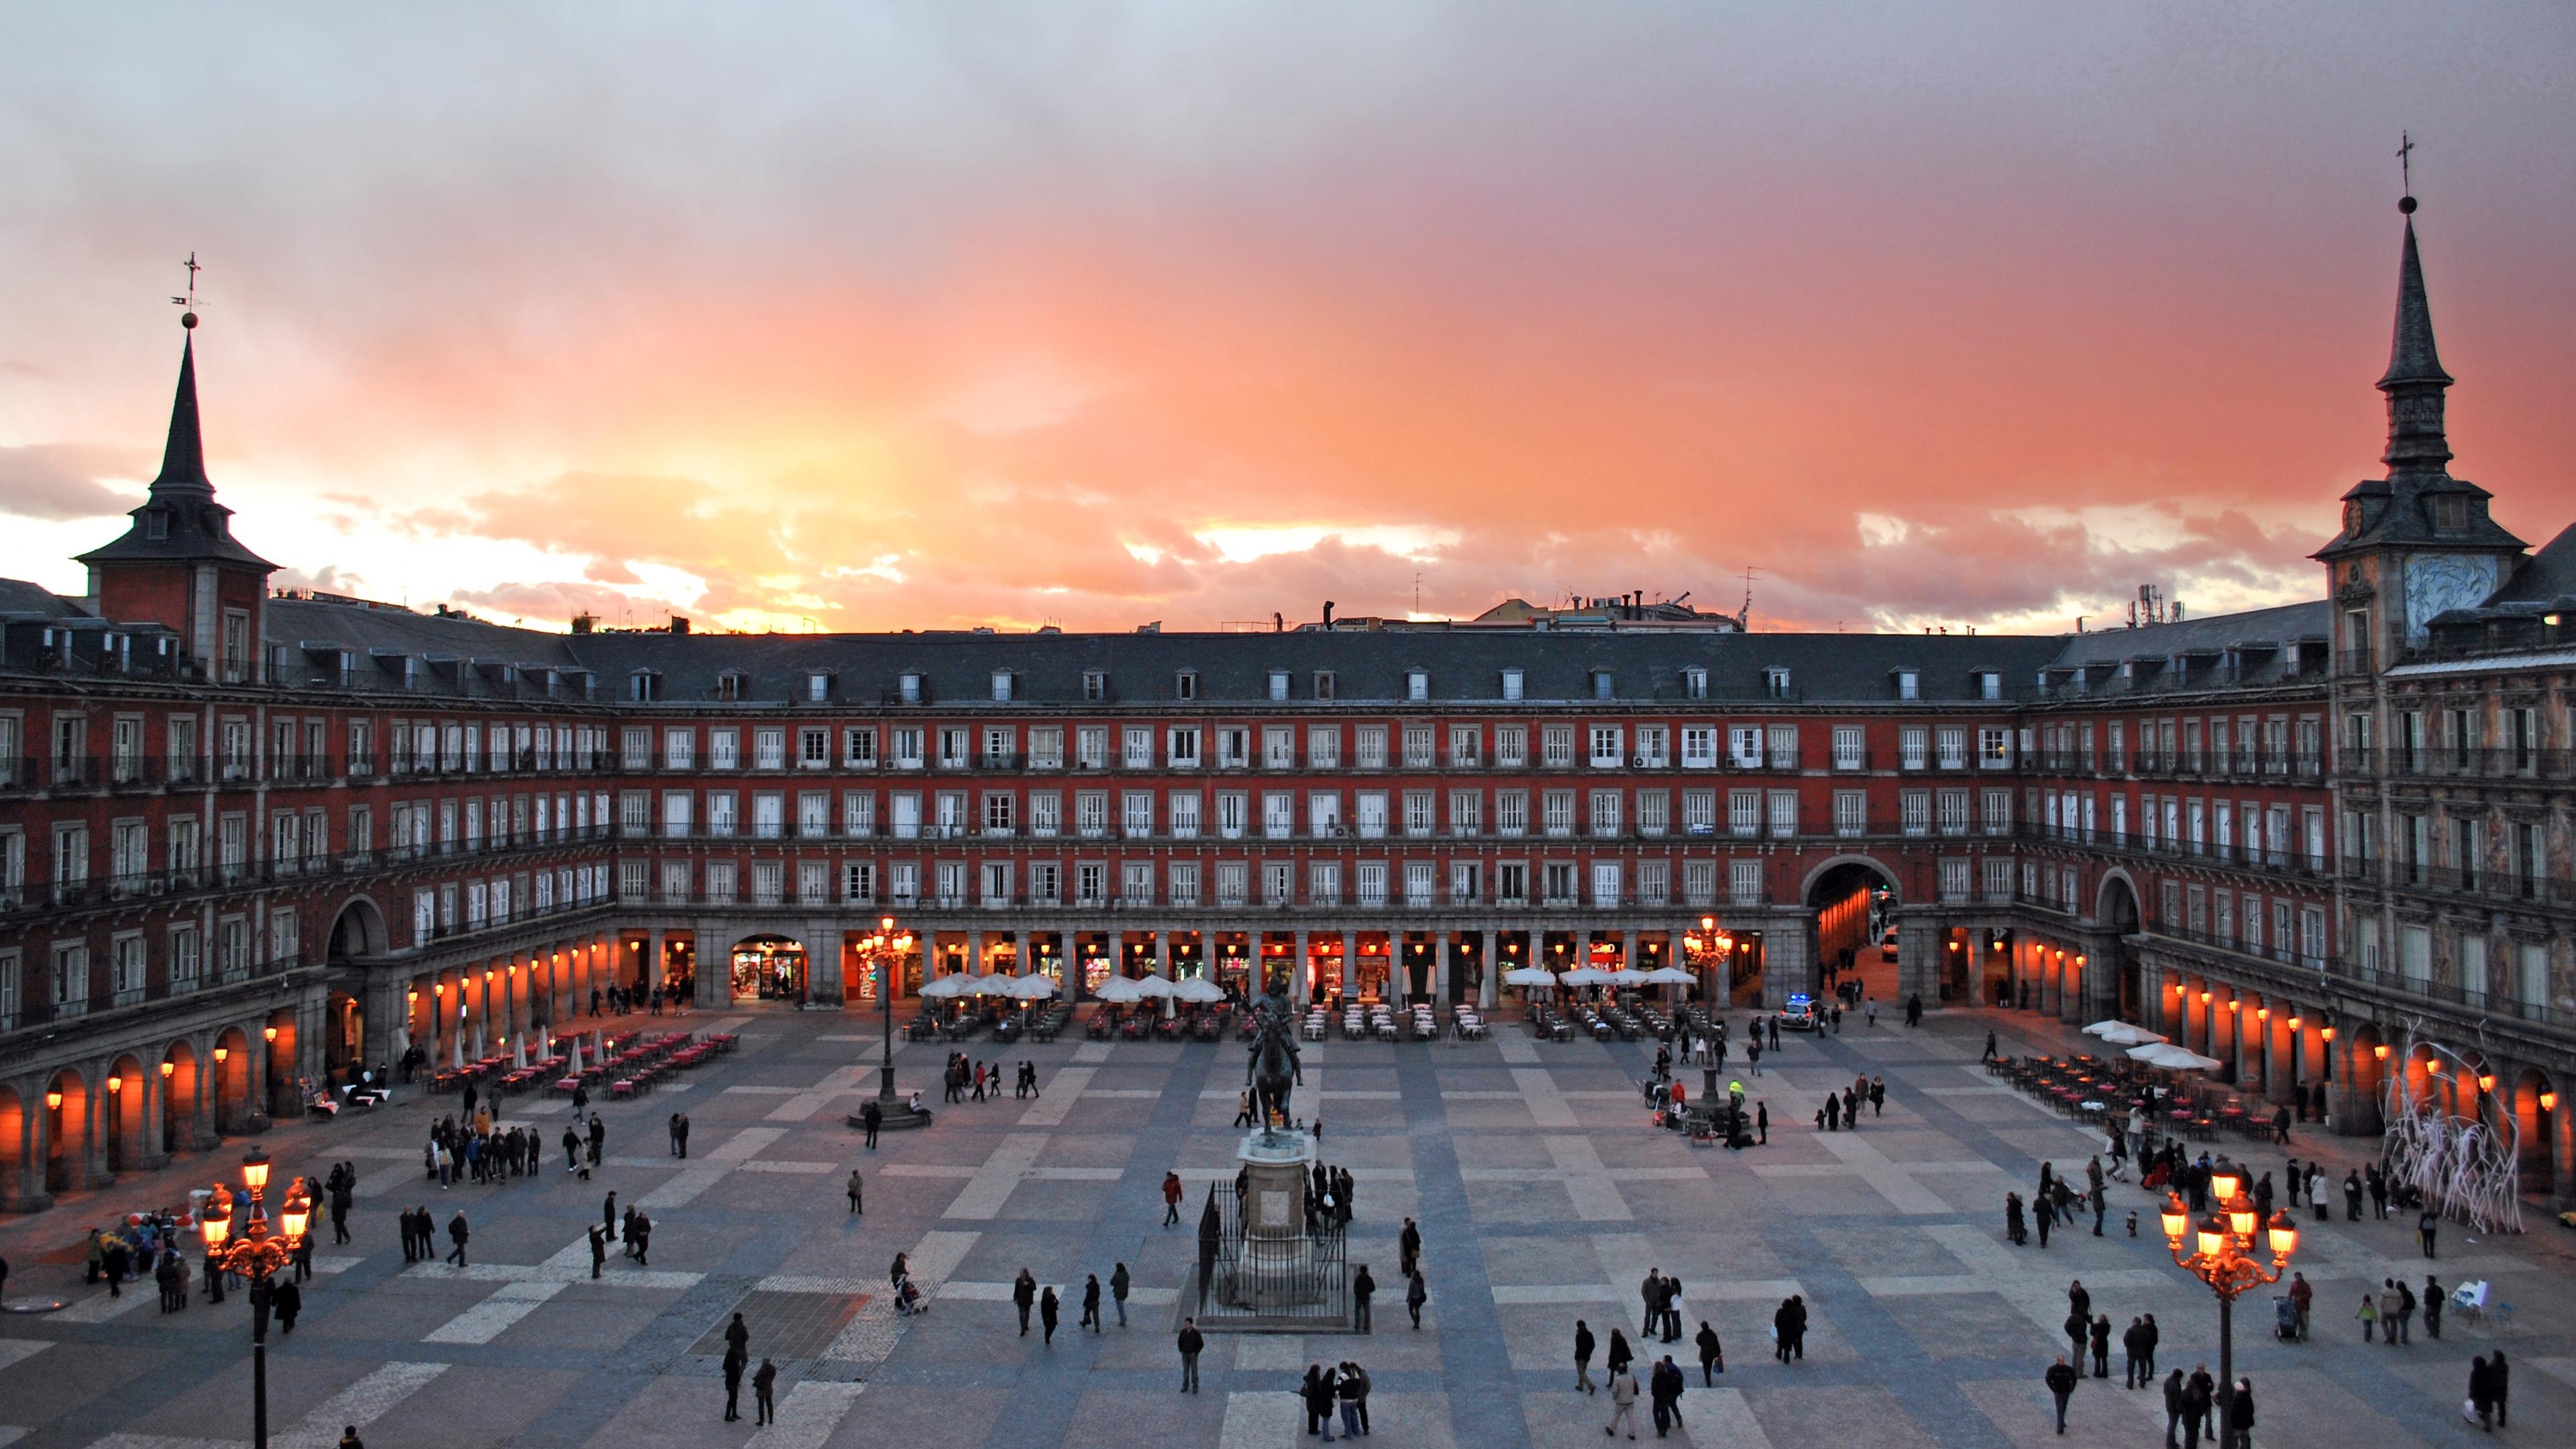 madrid spain exhibition center plaza mayor ifema feria de madrid 4k 1538066731 - madrid, spain, exhibition center, plaza mayor, ifema feria de madrid 4k - Spain, Madrid, exhibition center